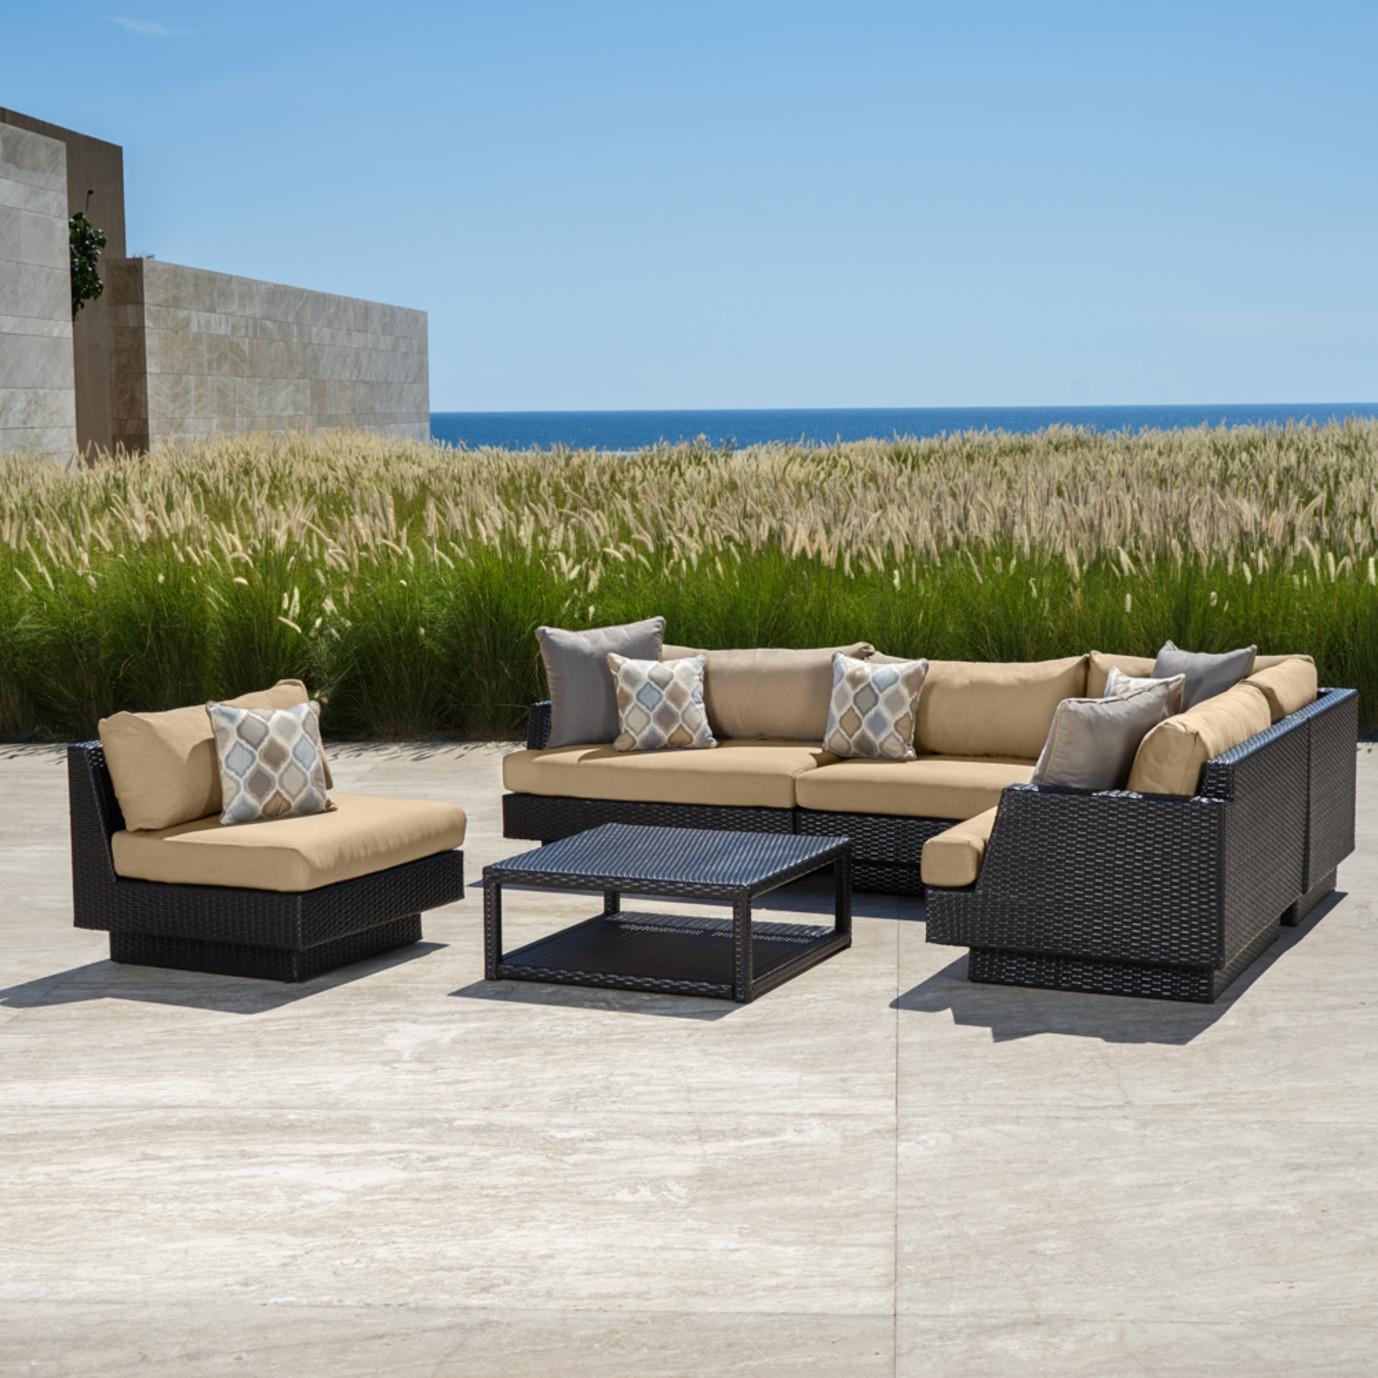 ... Portofino™ Comfort 6pc Sofa Sectional - Heather Beige ... - Portofino Comfort 6pc Sofa Sectional - Heather BeigeRST Brands